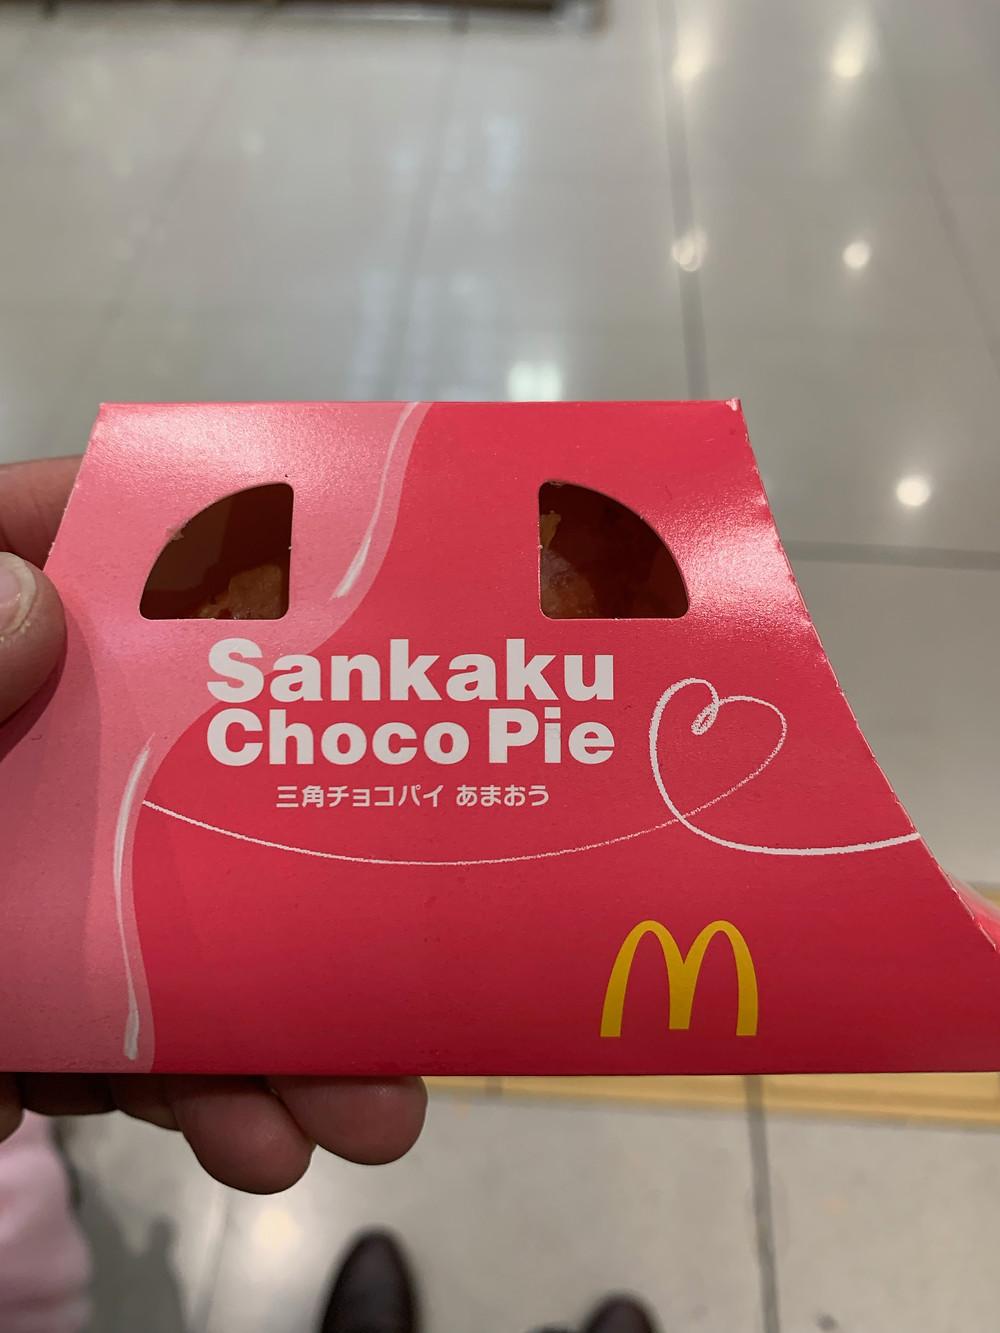 Pink Strawberry Sankaku Choco Pie from McDonald's in Japan